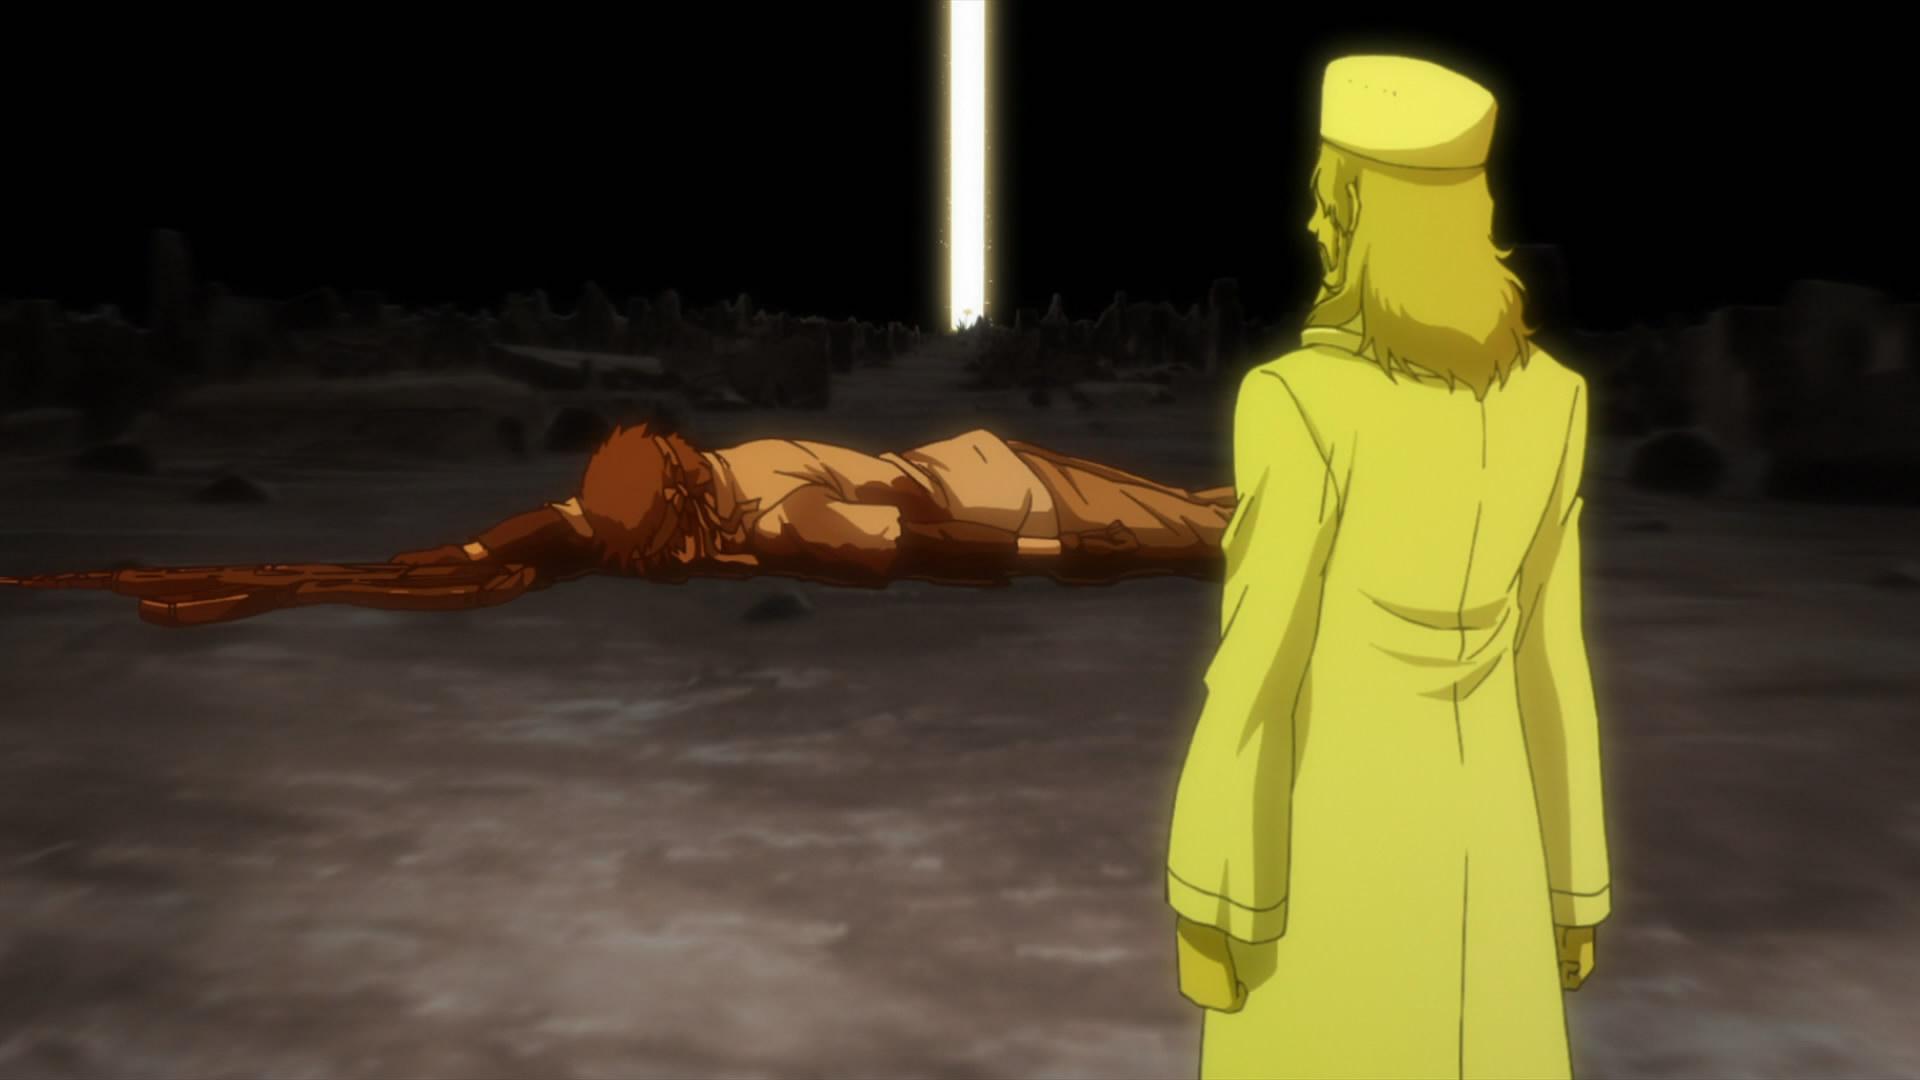 [gSS]_Mobile_Suit_Gundam_00_-_A_wakening_of_the_Trailblazer_(1080p)_[2B252856].mkv_snapshot_01.31.55_[2011.01.07_04.45.36]